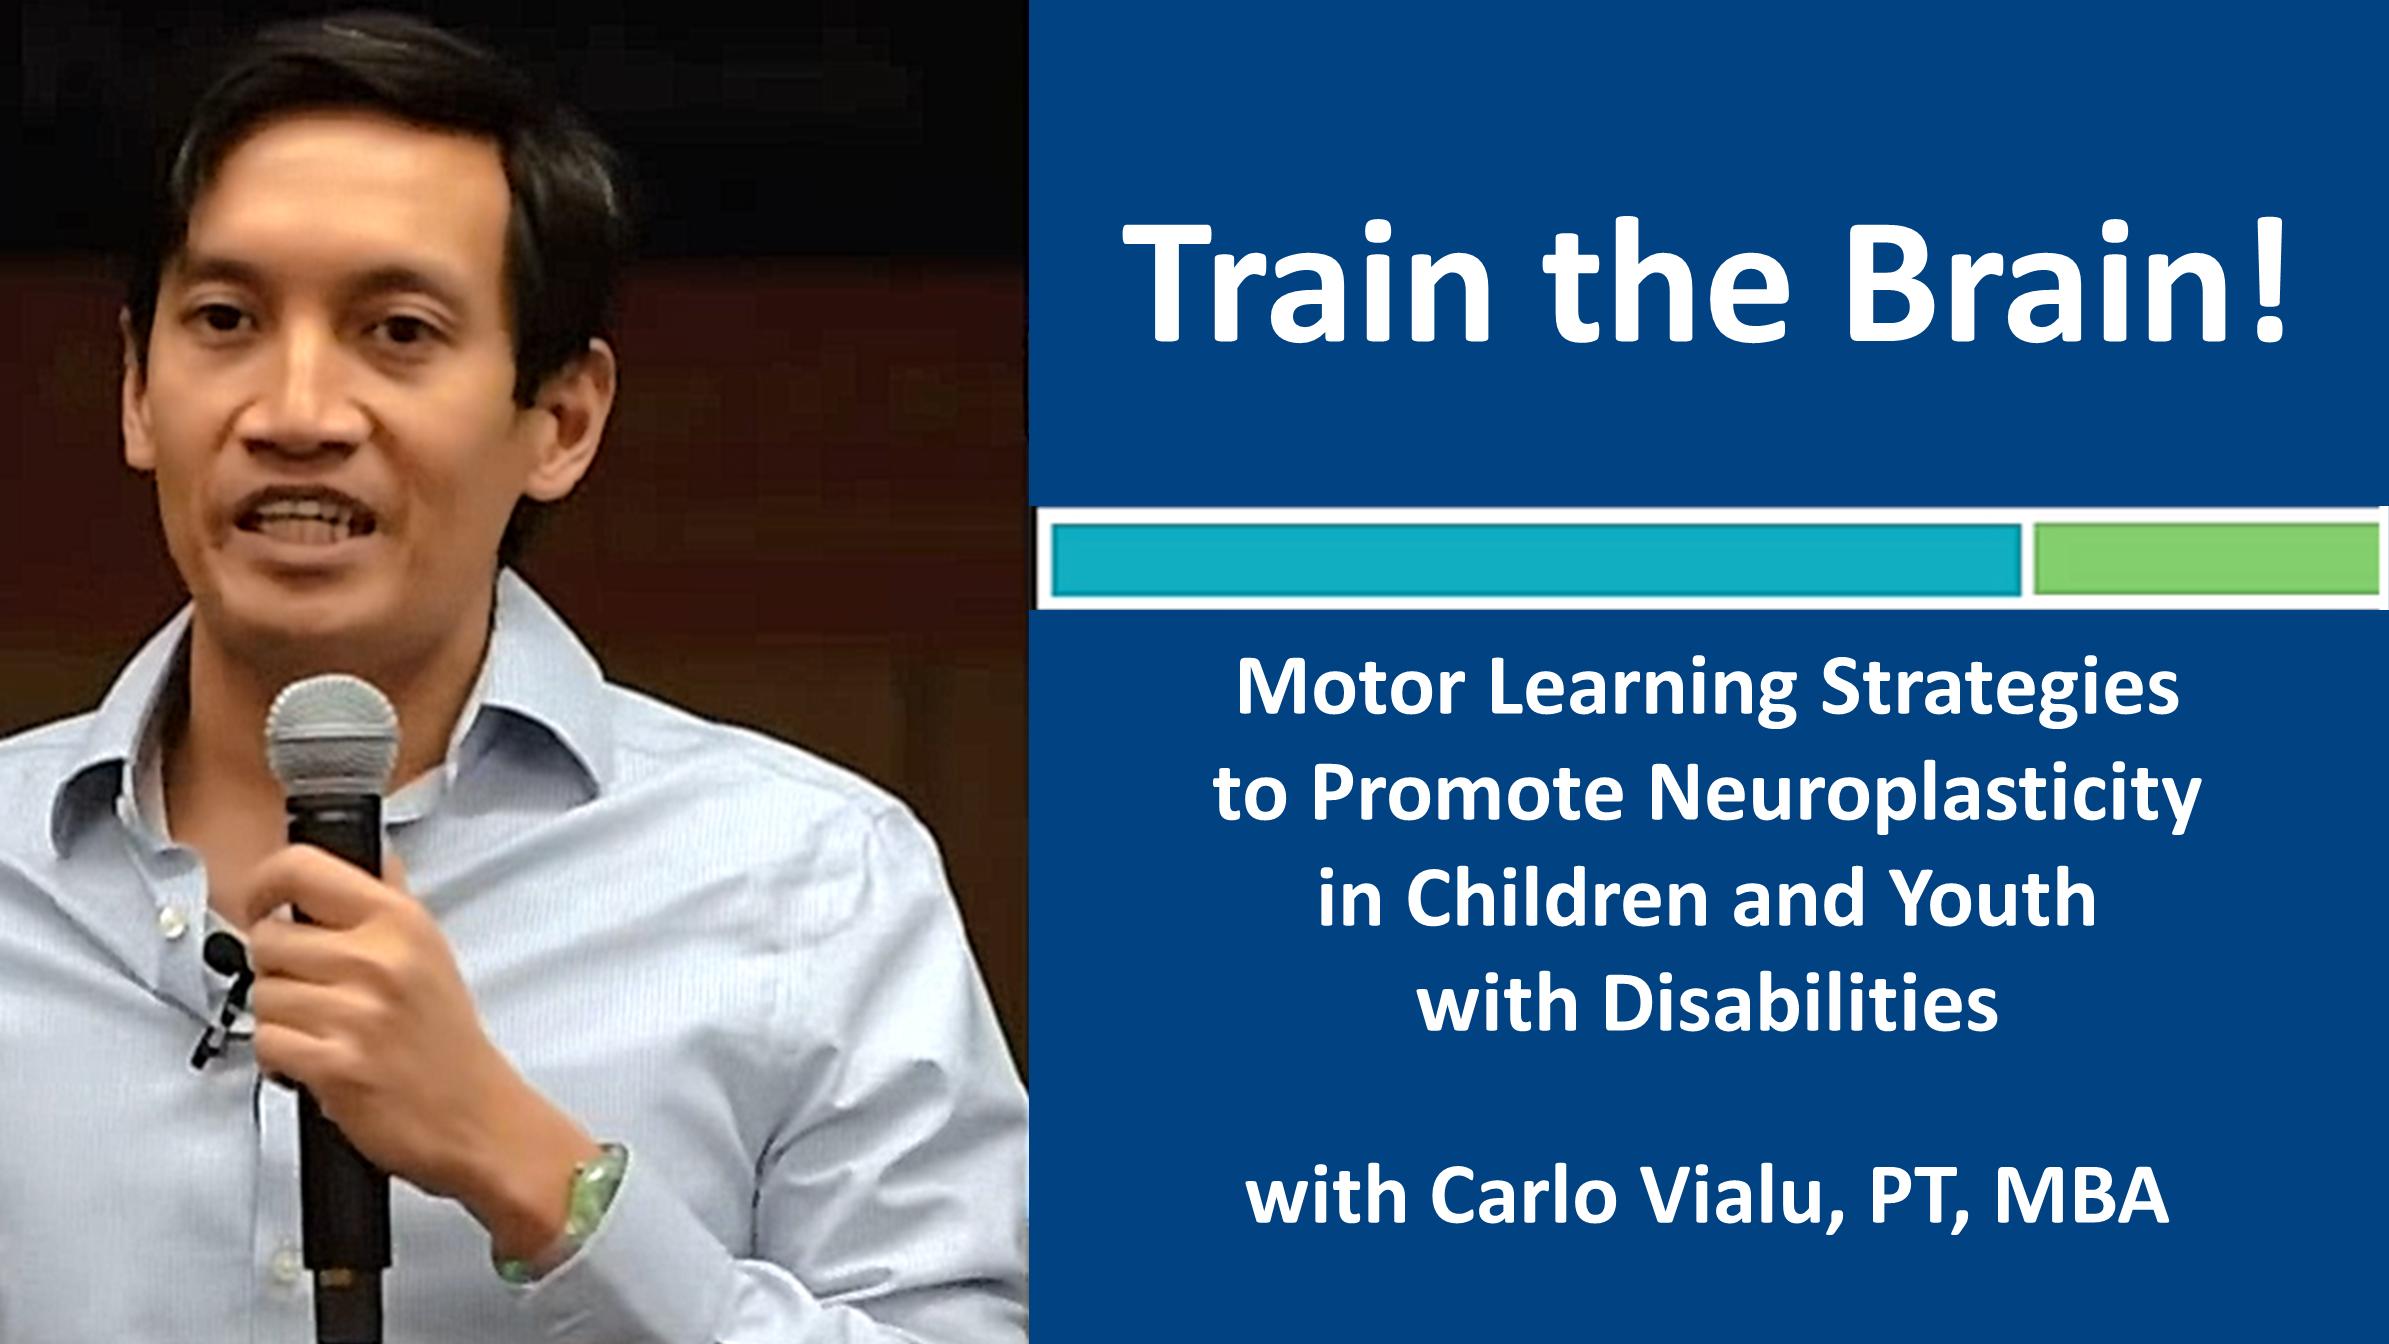 Webinar 2: Train the Brain with Carlo Vialu, PT, MBA